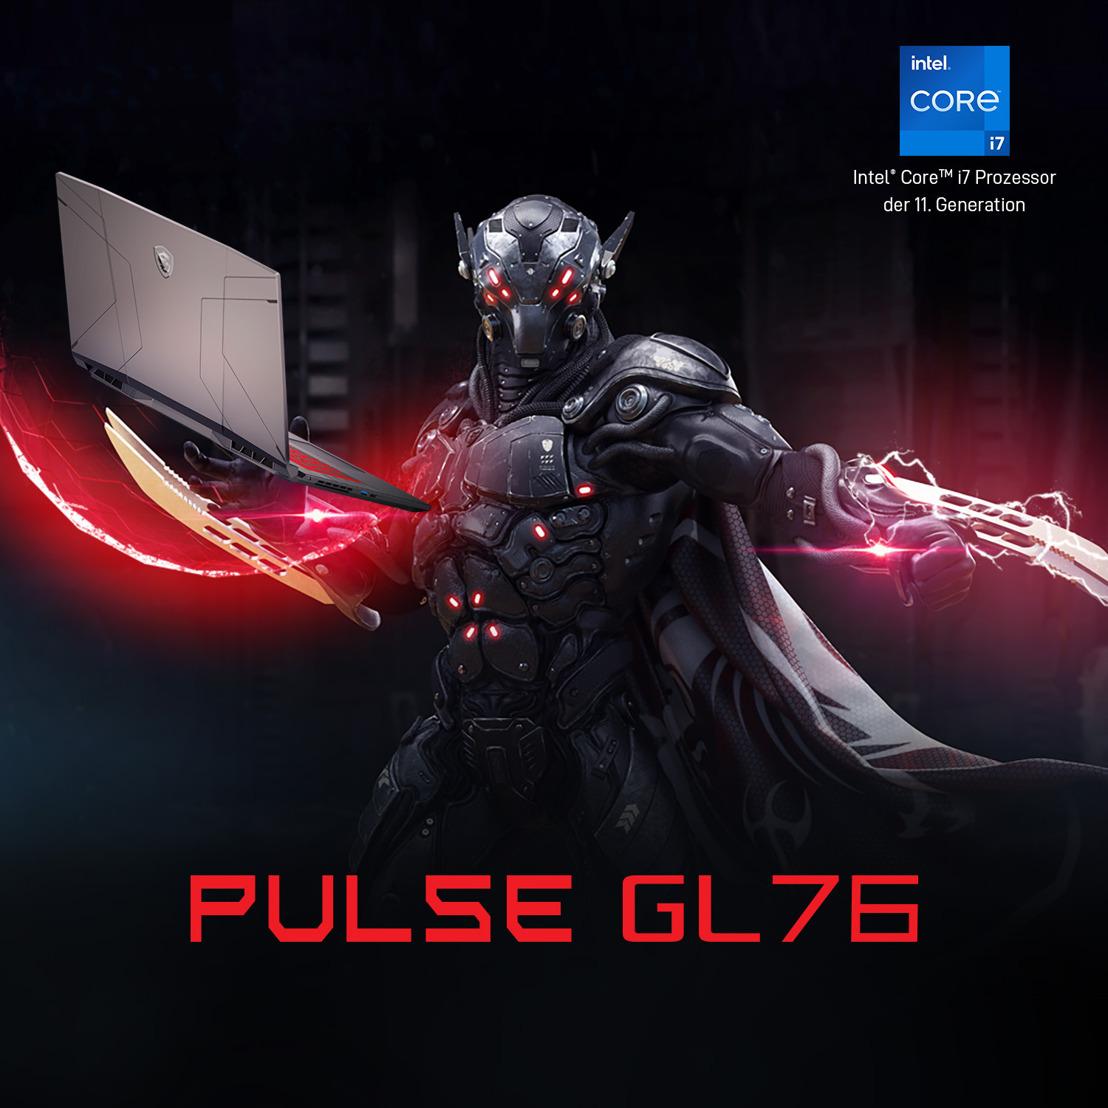 Pulse GL76: Laptop-Gaming auf imposantem Niveau